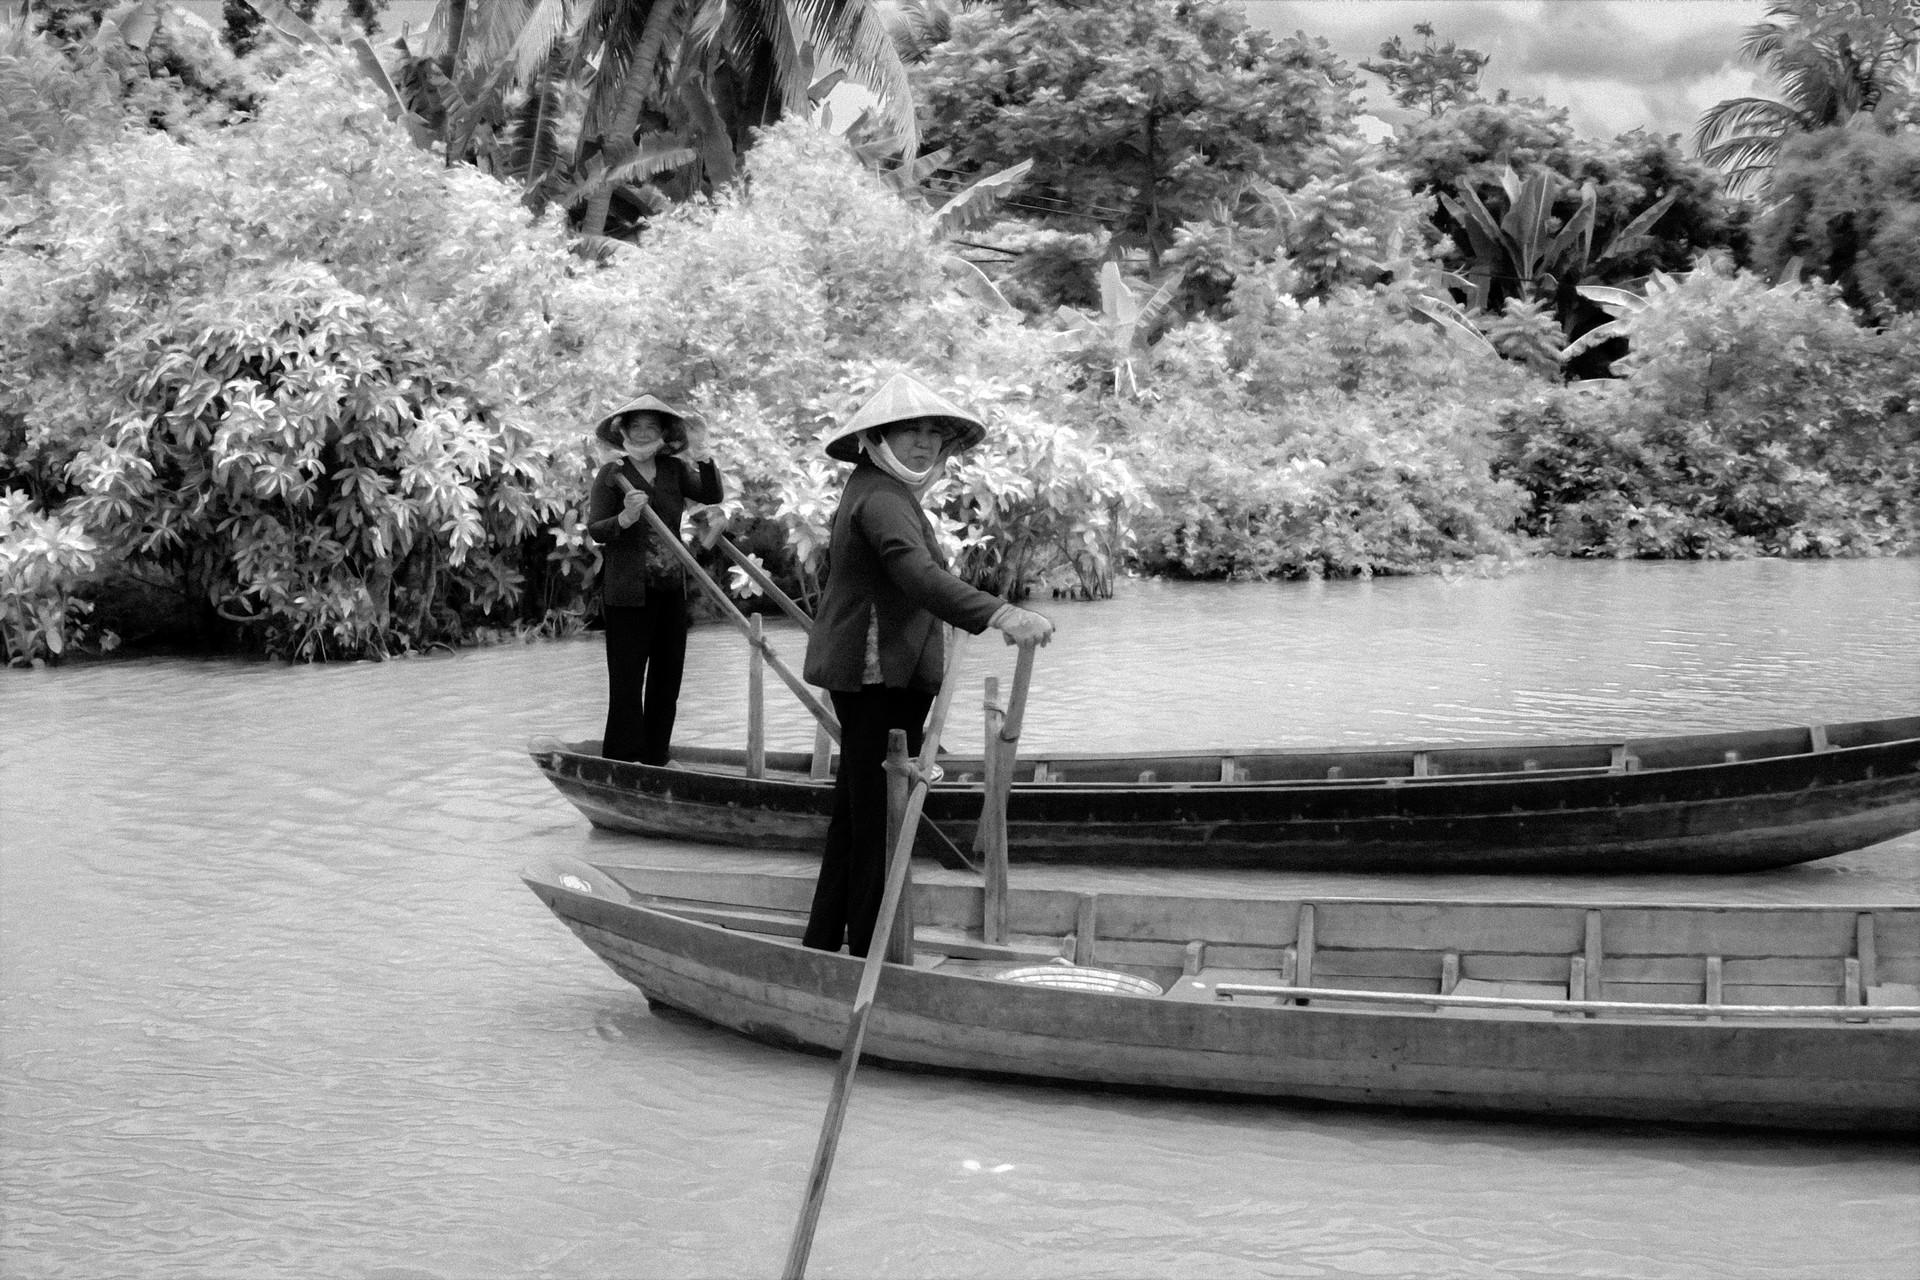 Boat Carrier